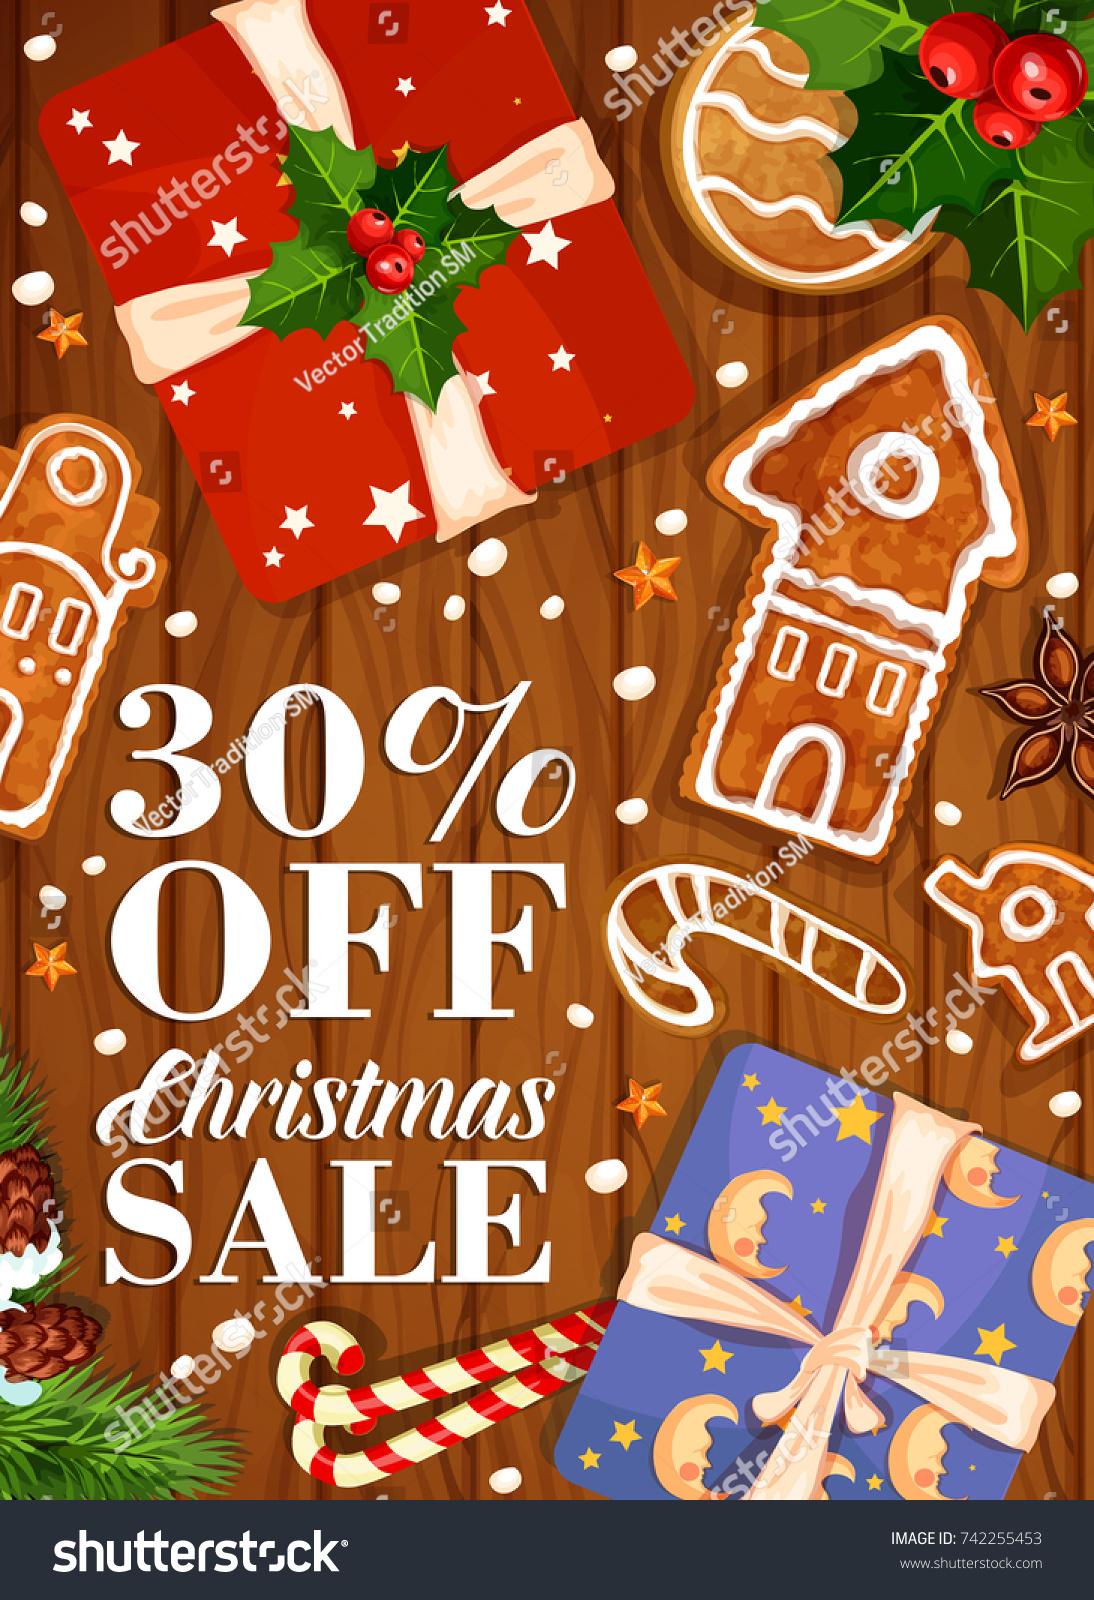 Christmas Sale Poster Santa Gifts Winter Stock Vector (Royalty Free ...